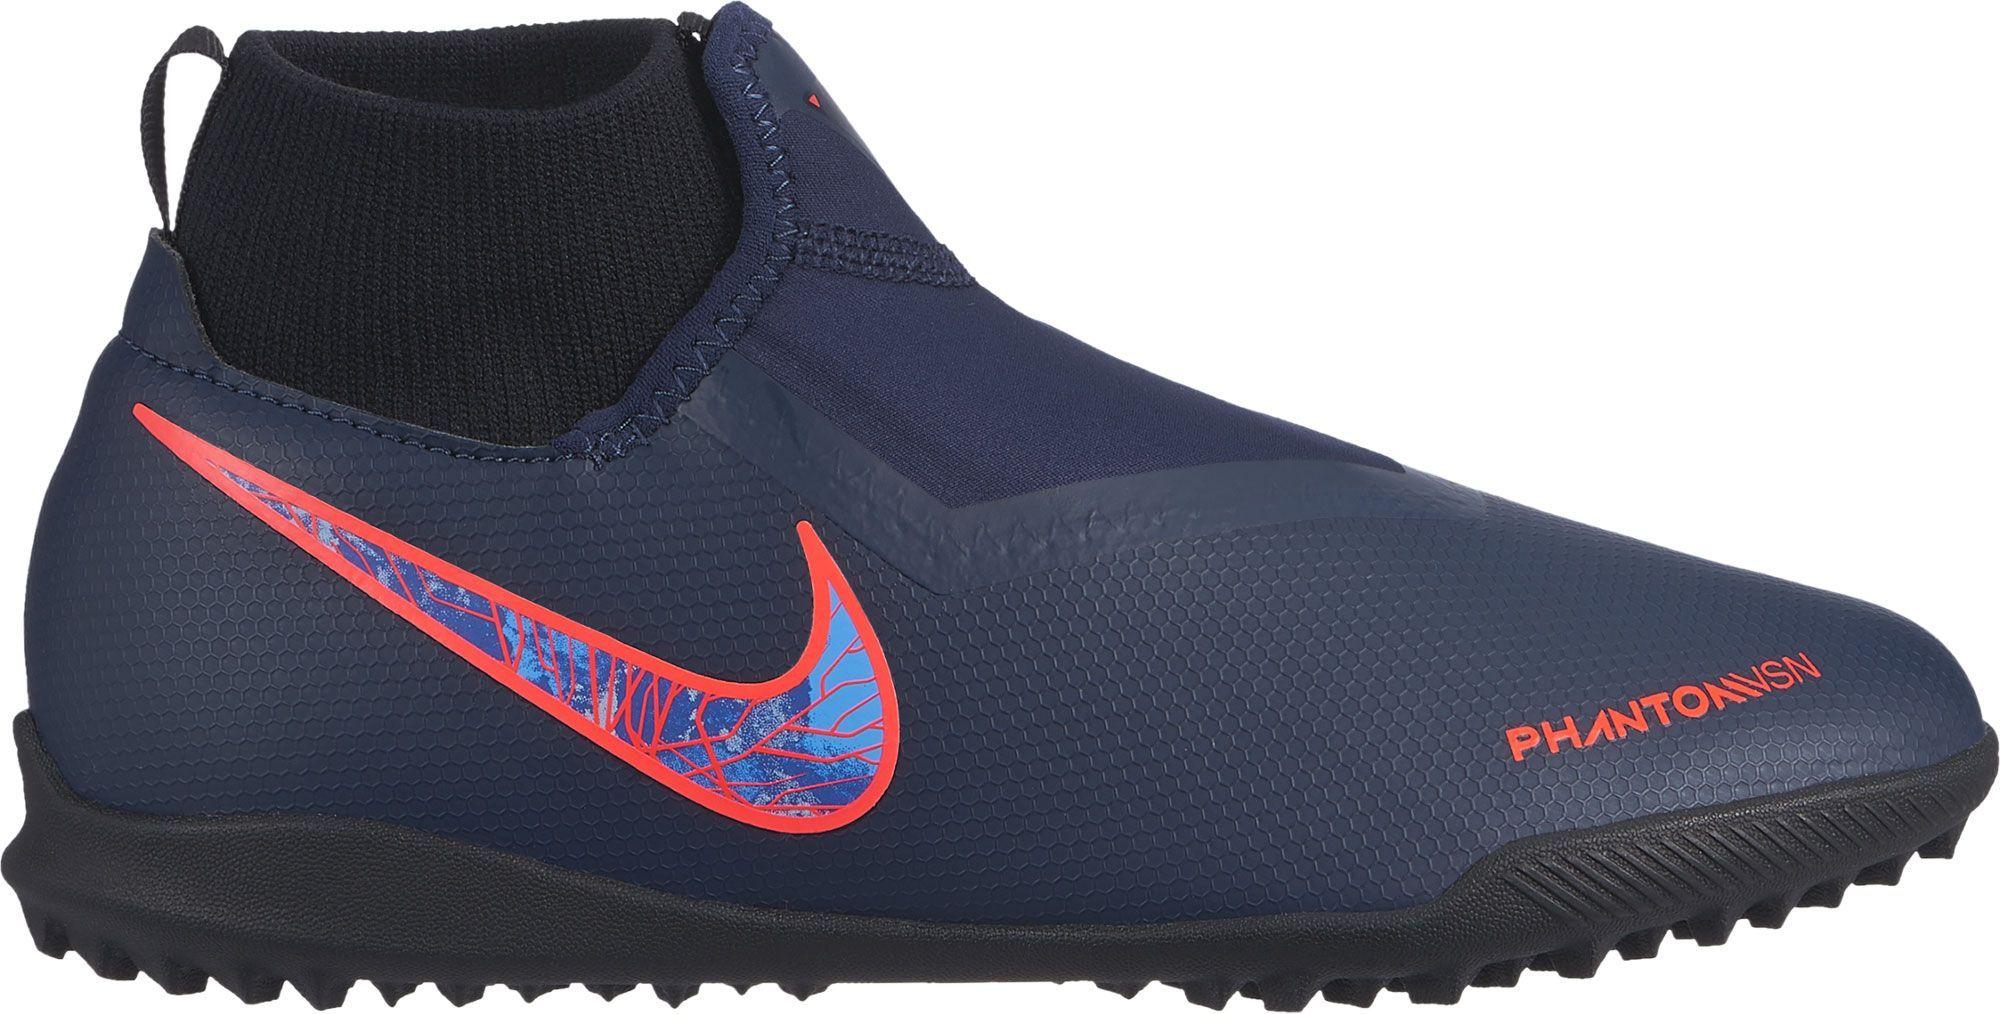 Nike Roshe Run One Print Grey Cr7 Shoes Indoor | City of Las